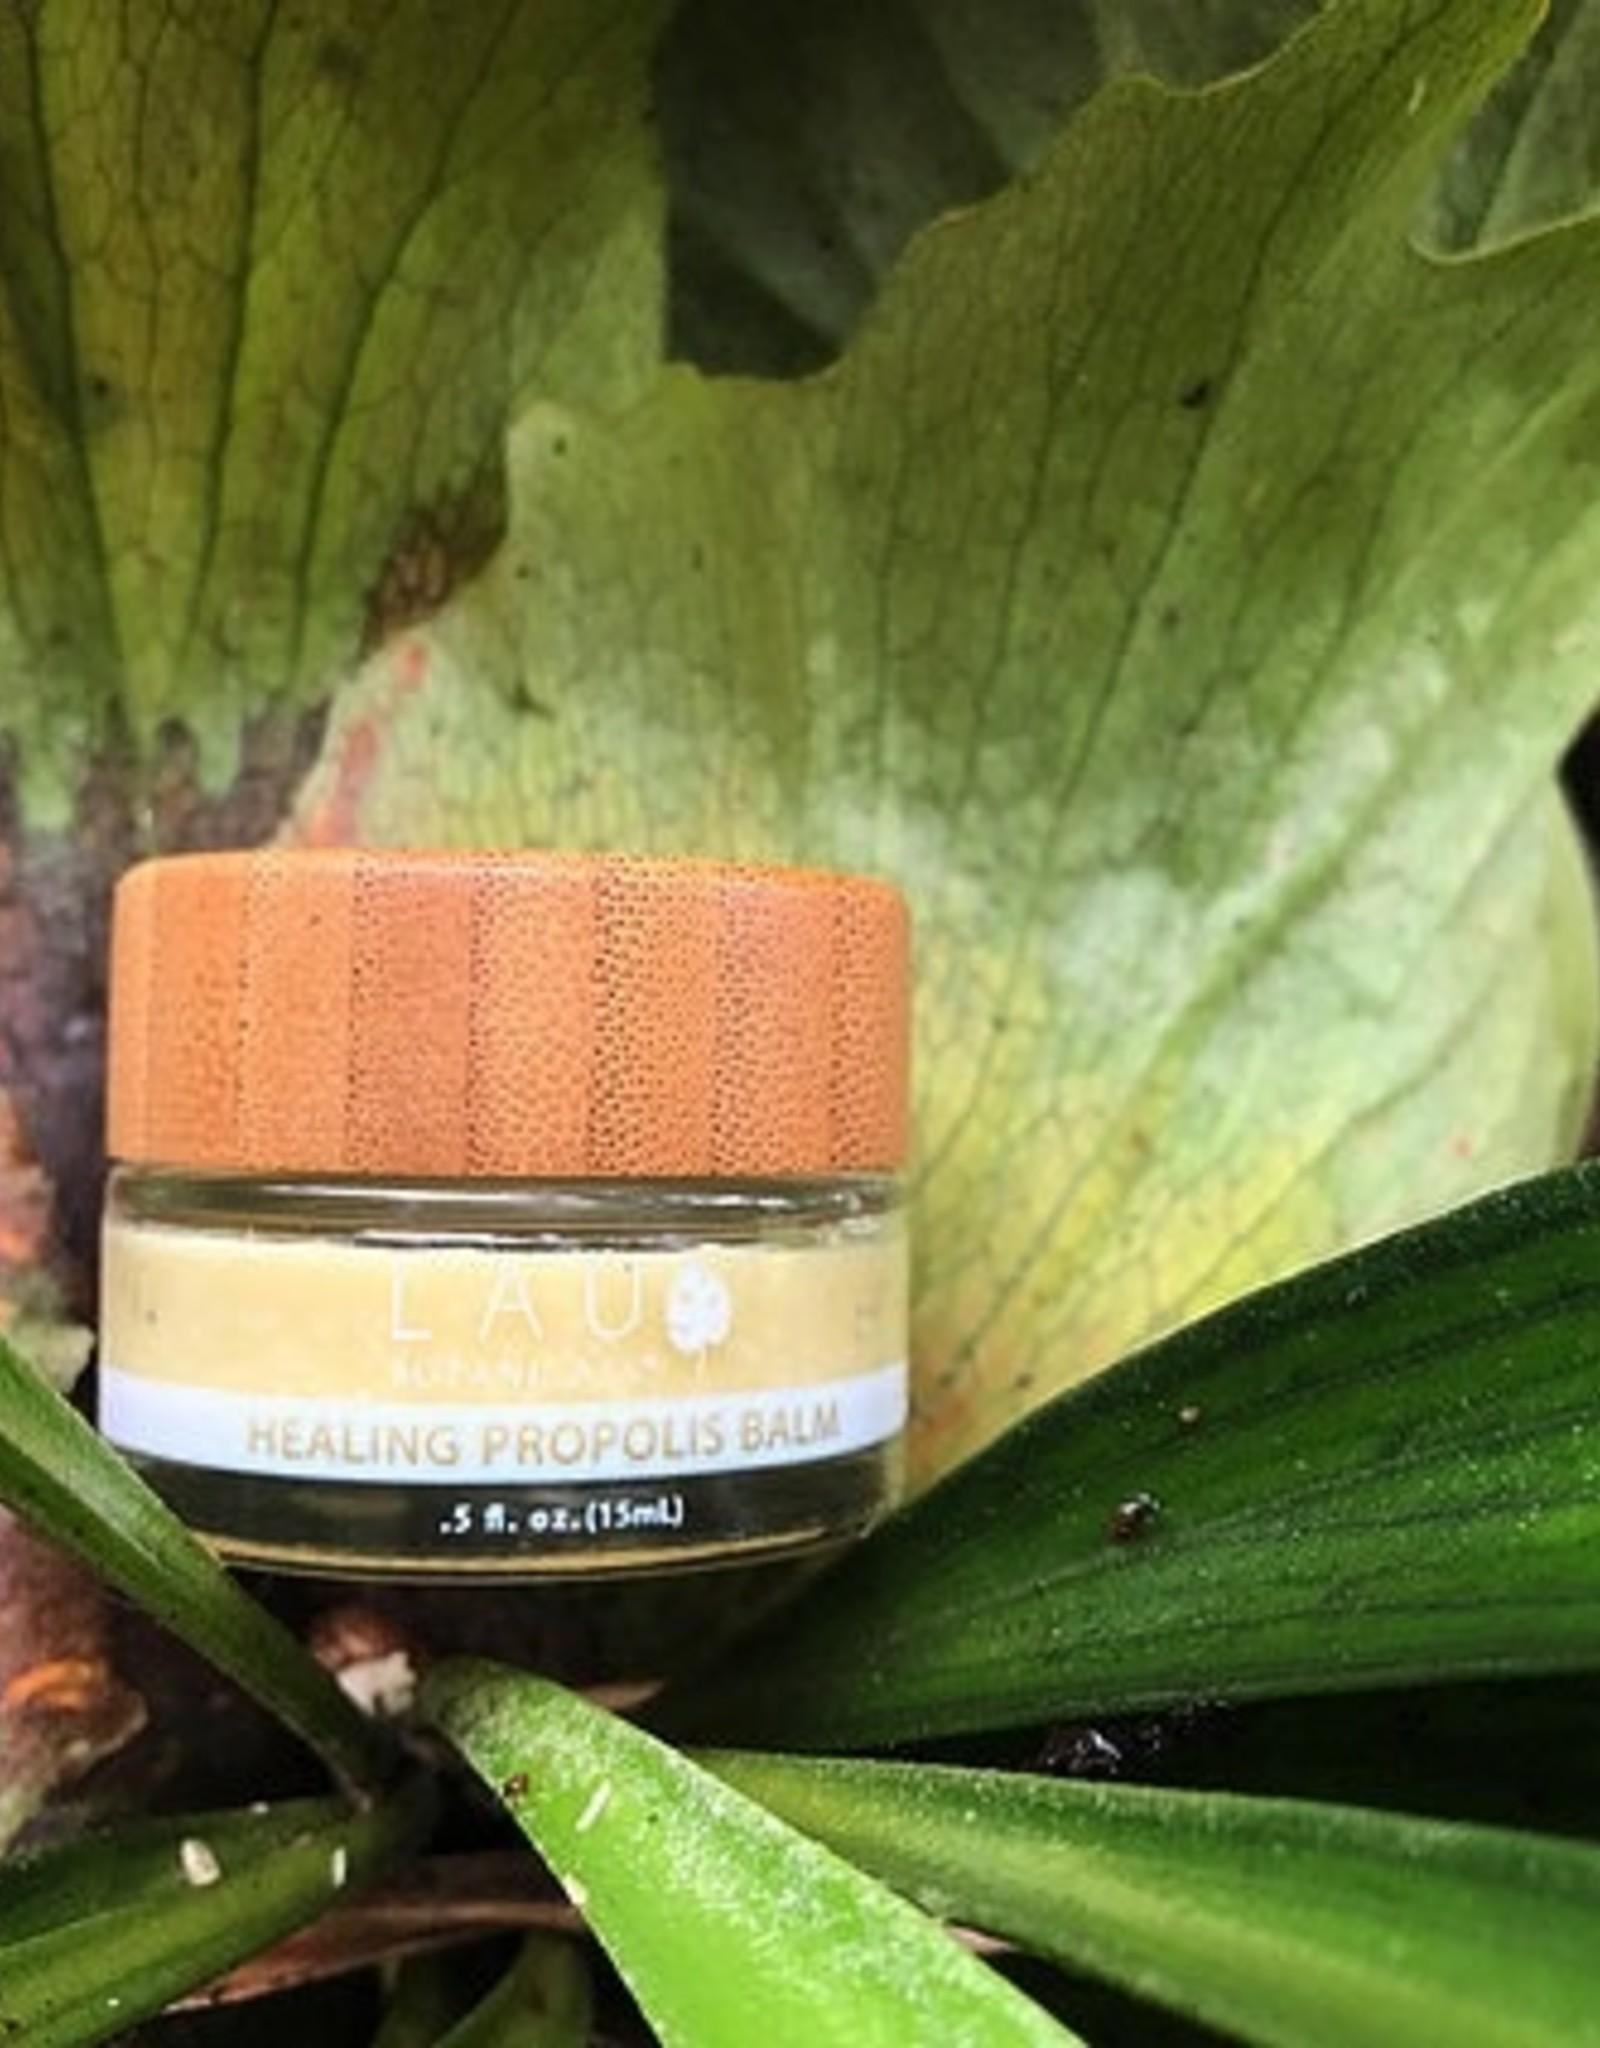 Skincare Lau Botanicals - Healing Propolis Balm 0.5 fl.oz.